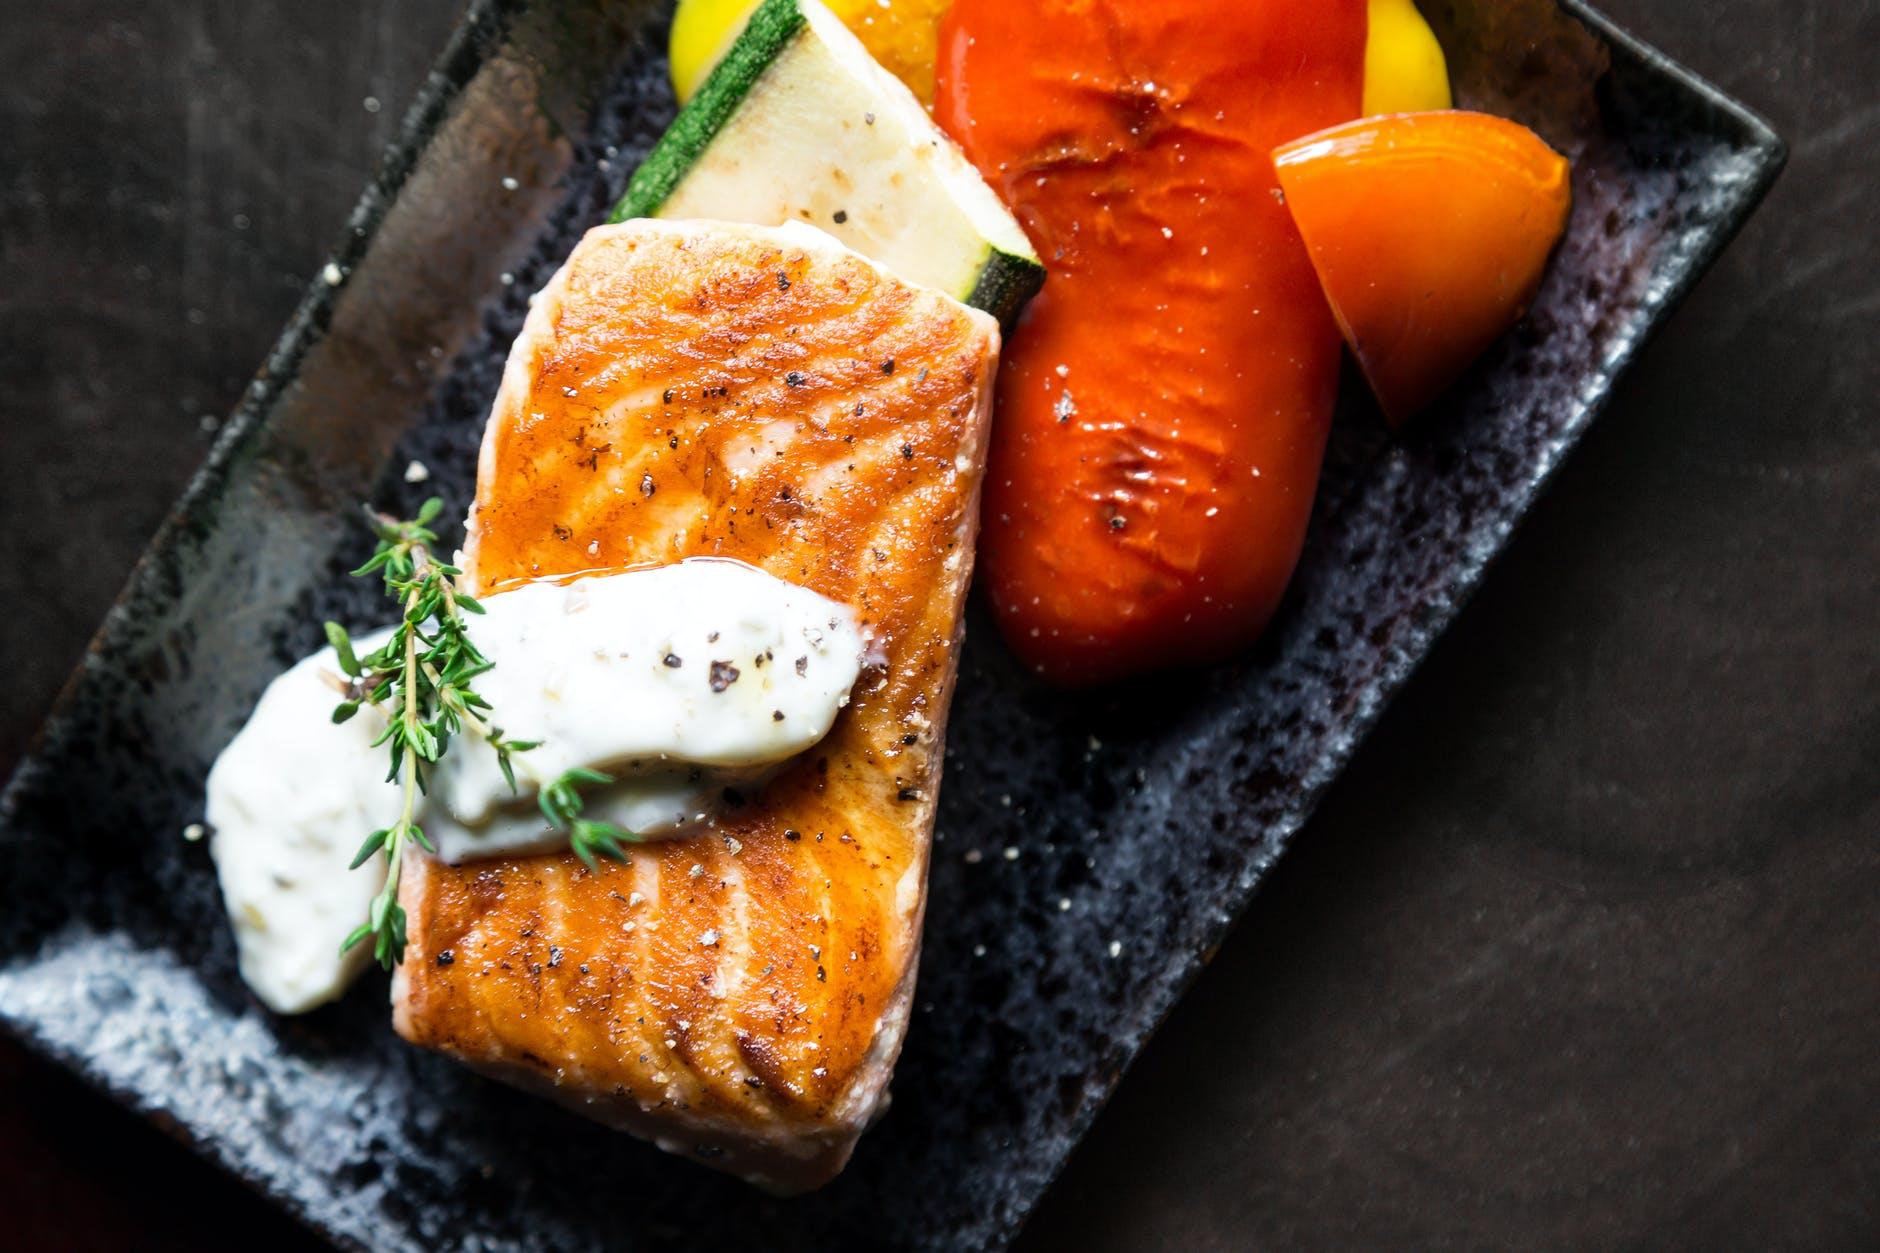 Omega-3s are abundant in salmon